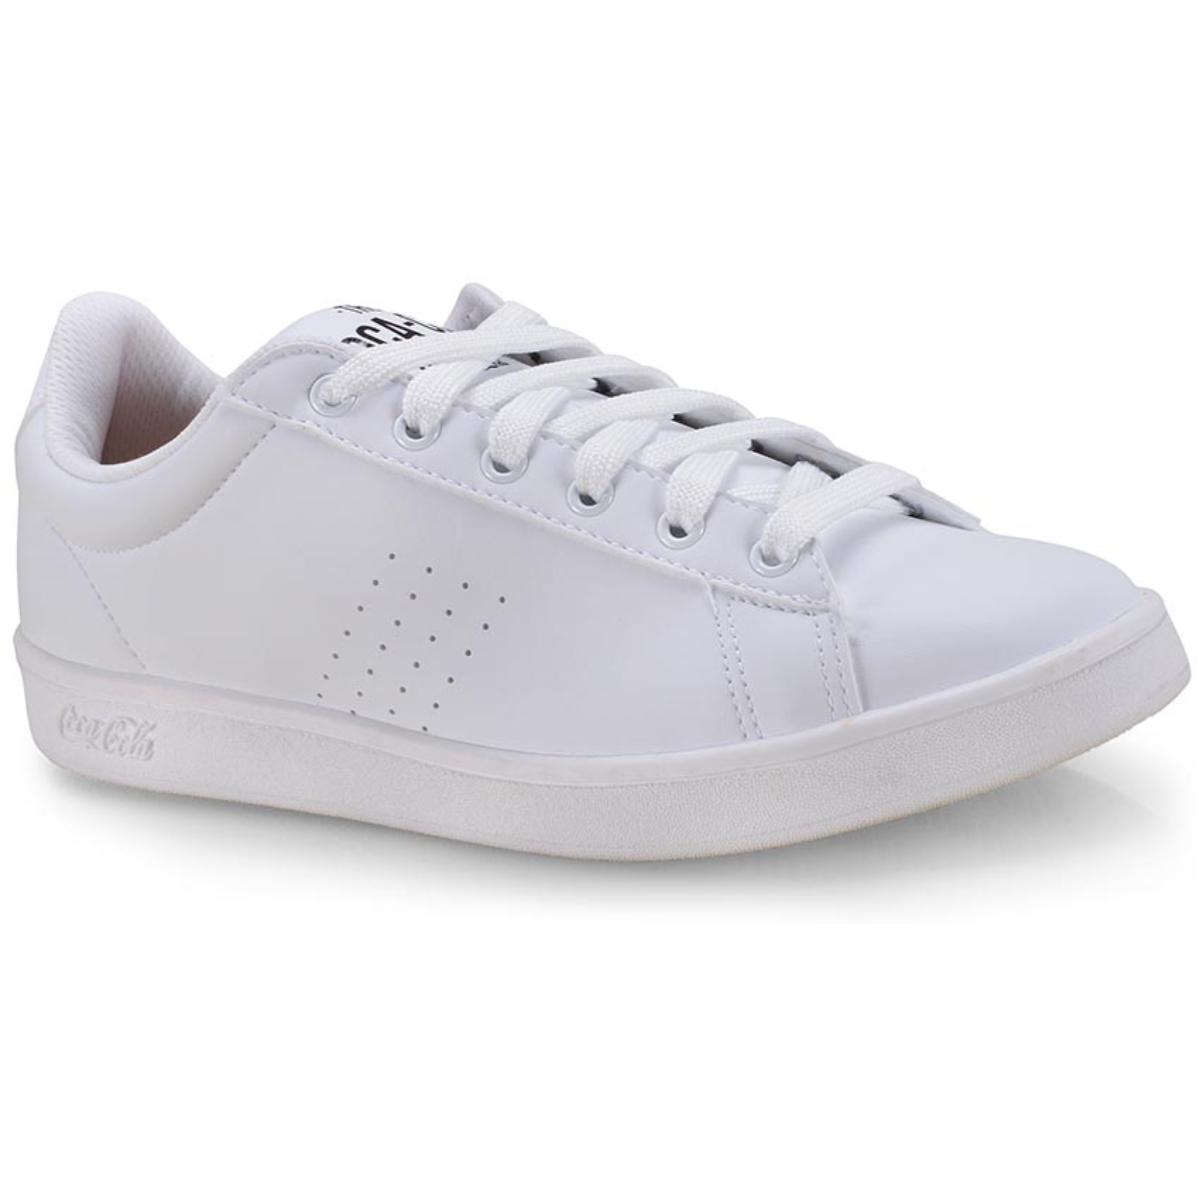 Tênis Masculino Coca-cola Shoes Cc1683 Branco